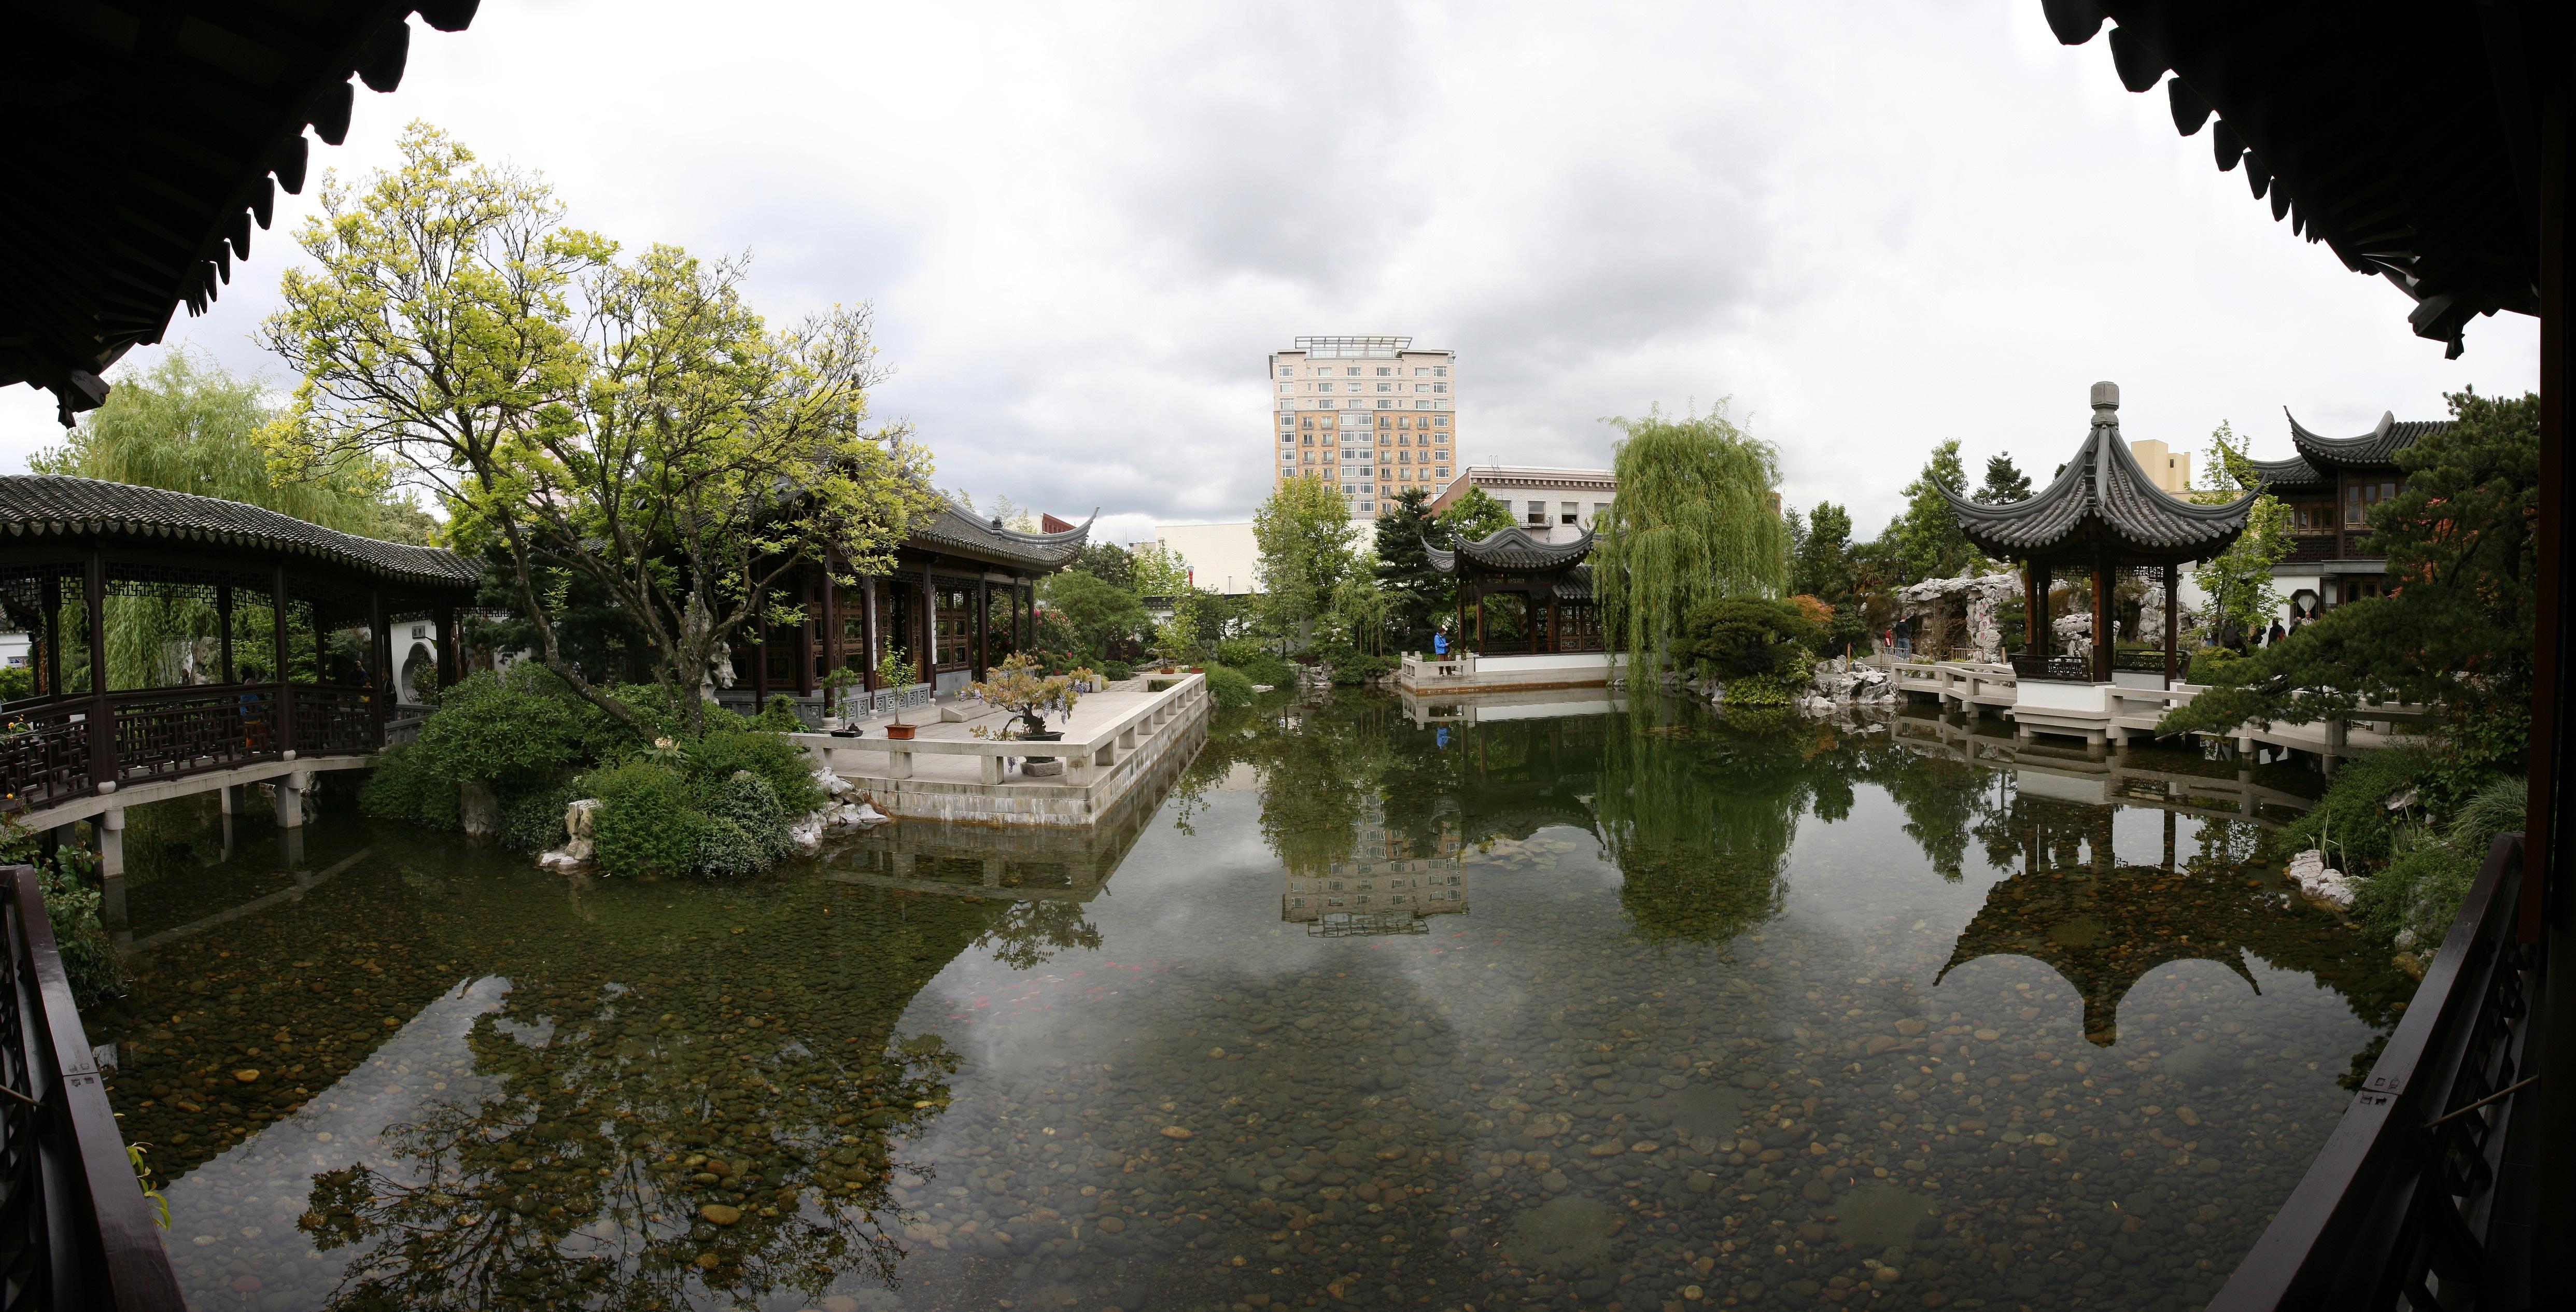 lan su chinese garden - wikipedia